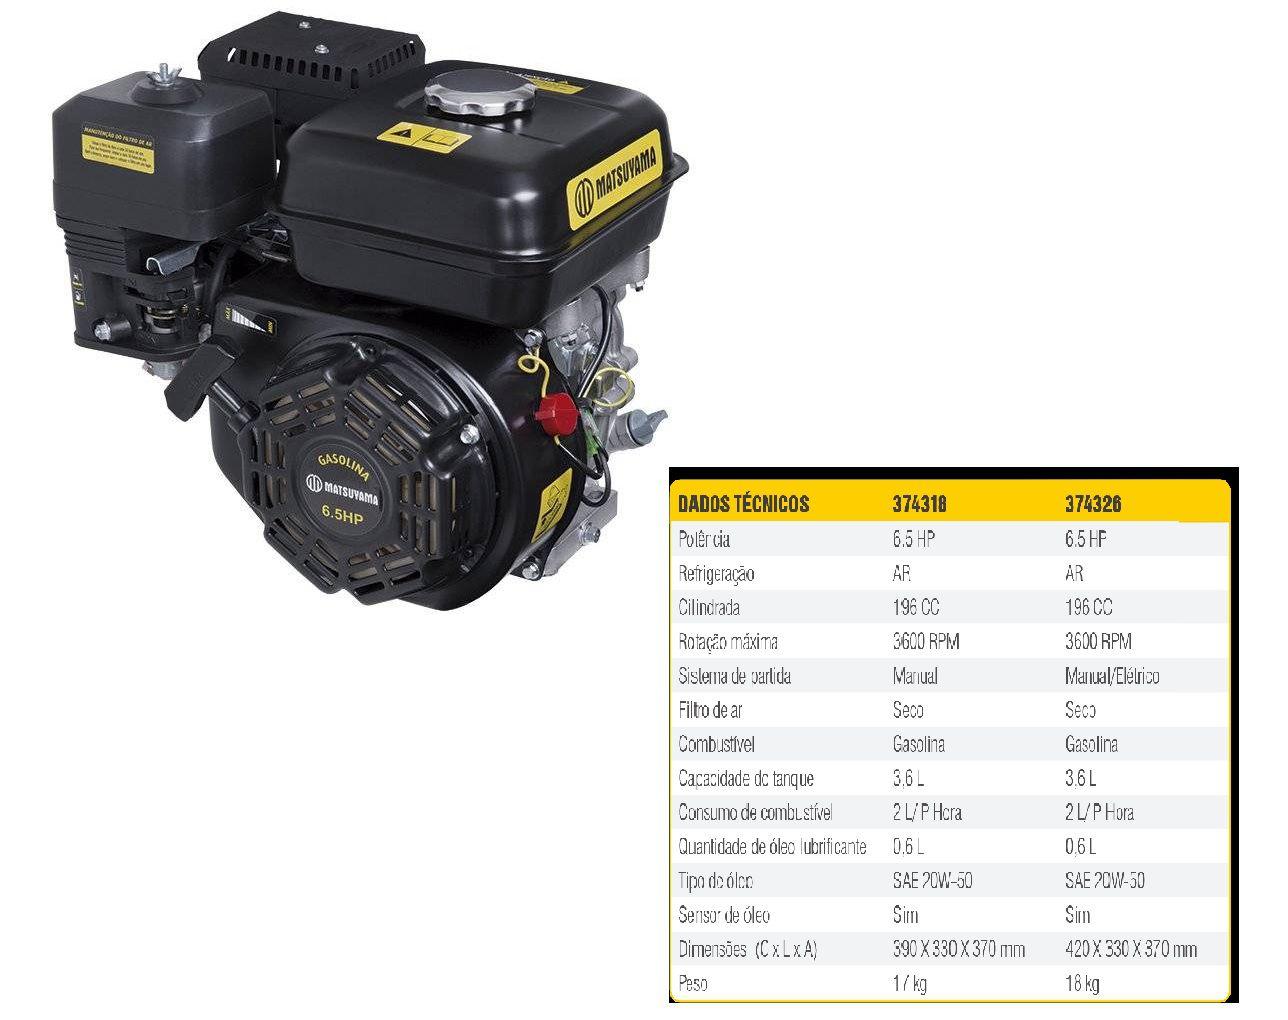 Motor à Gasolina Horizontal 6.5hp 196cc 4 Tempos - Matsuyama